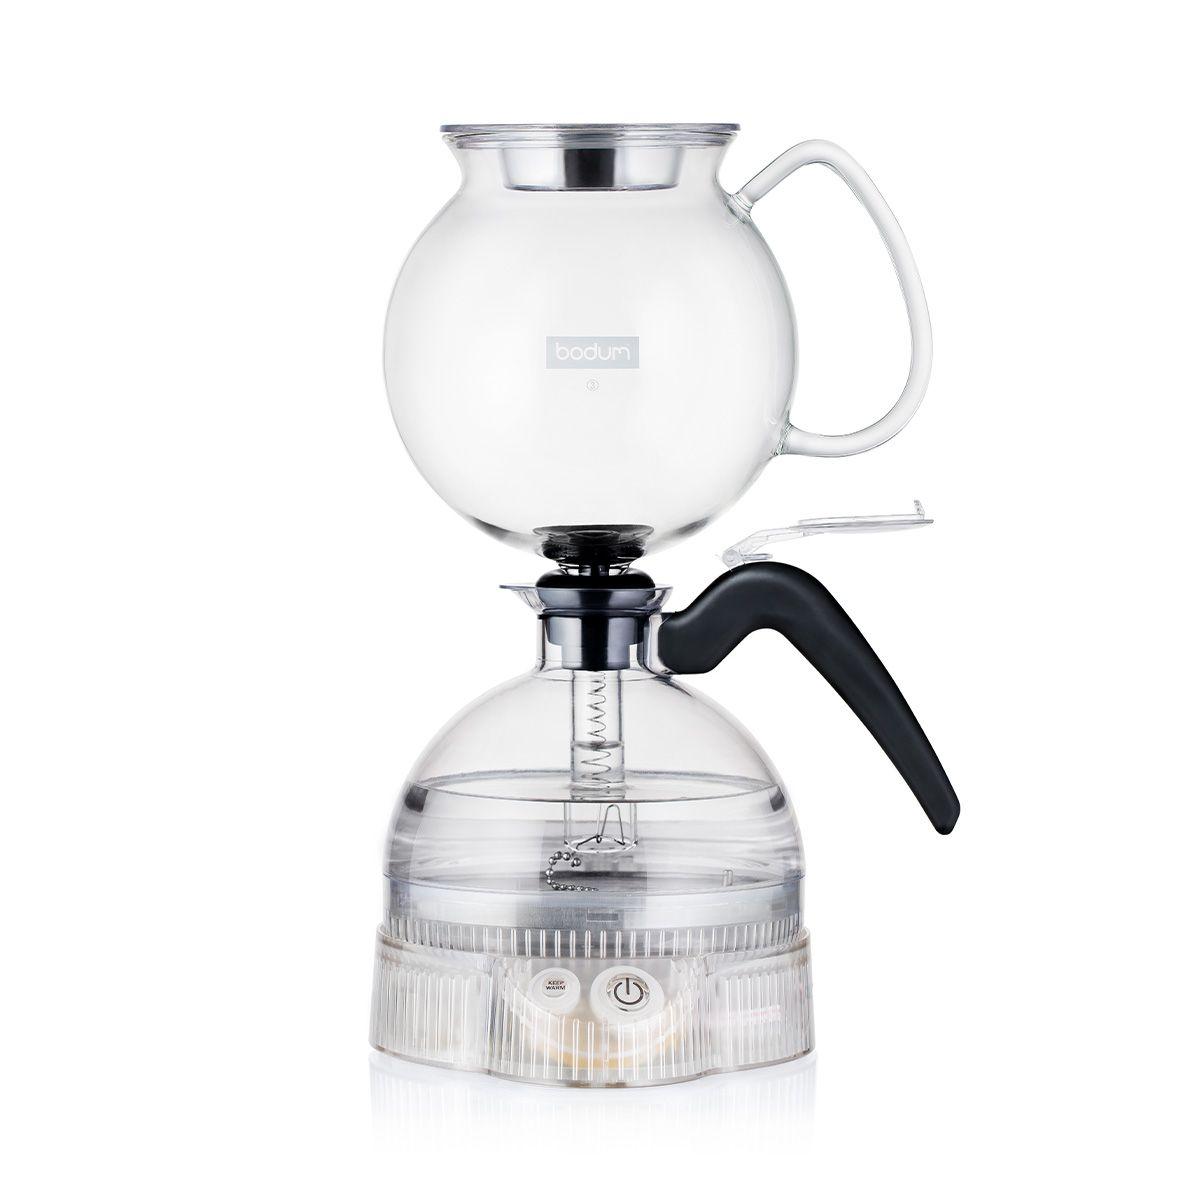 Vacuum Coffee Maker ePEBO 1.0 L